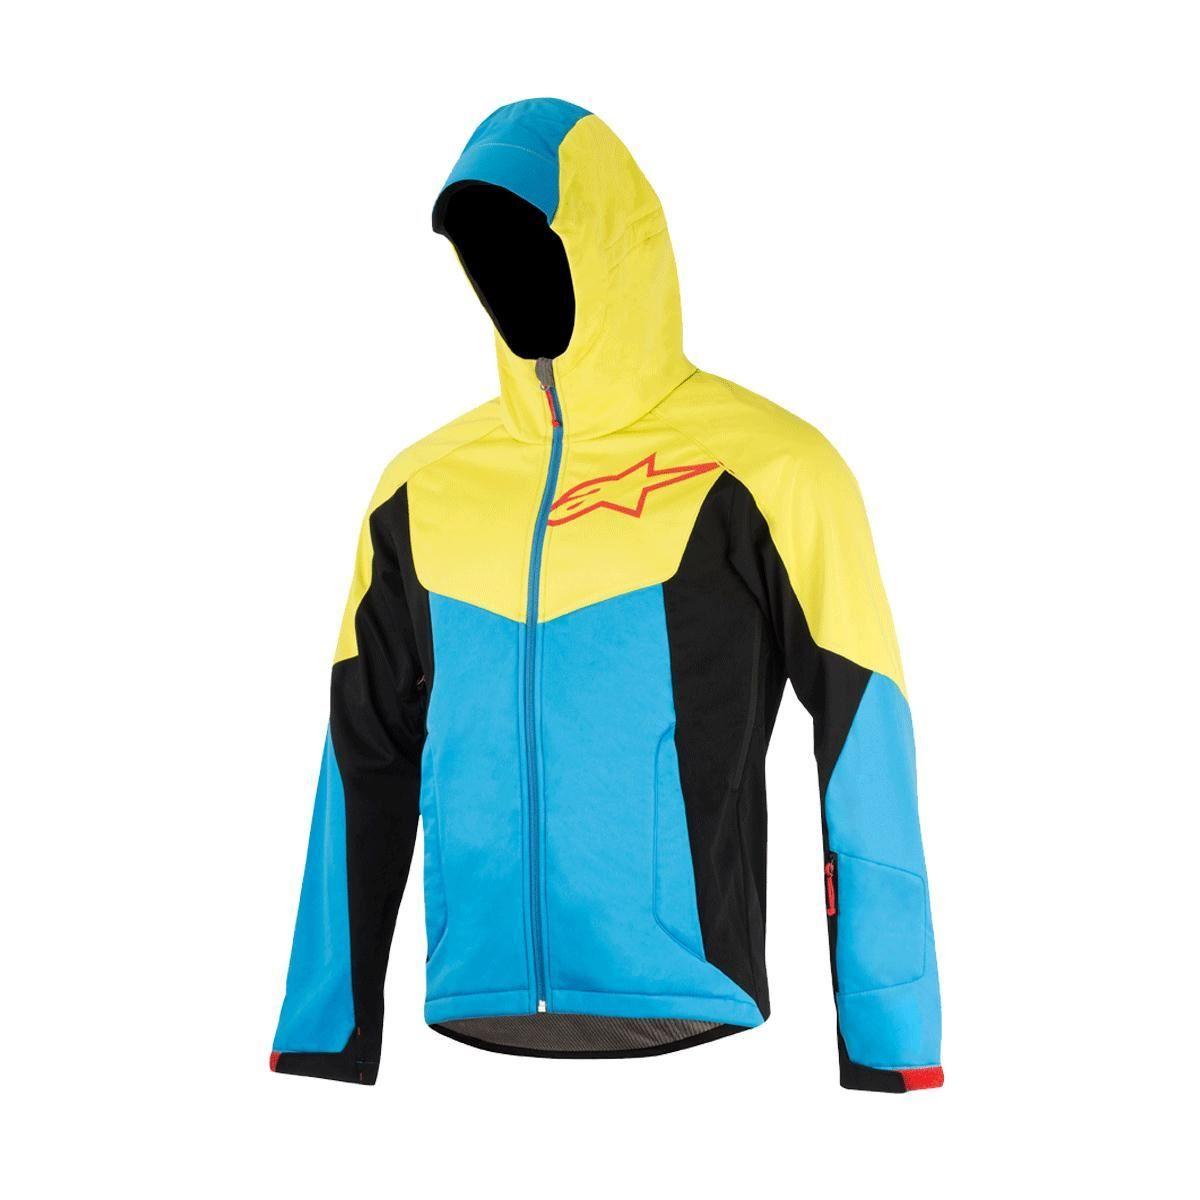 Alpinestars Milestone 2 Jacket 2017: Bright Blue/Acid Yellow L